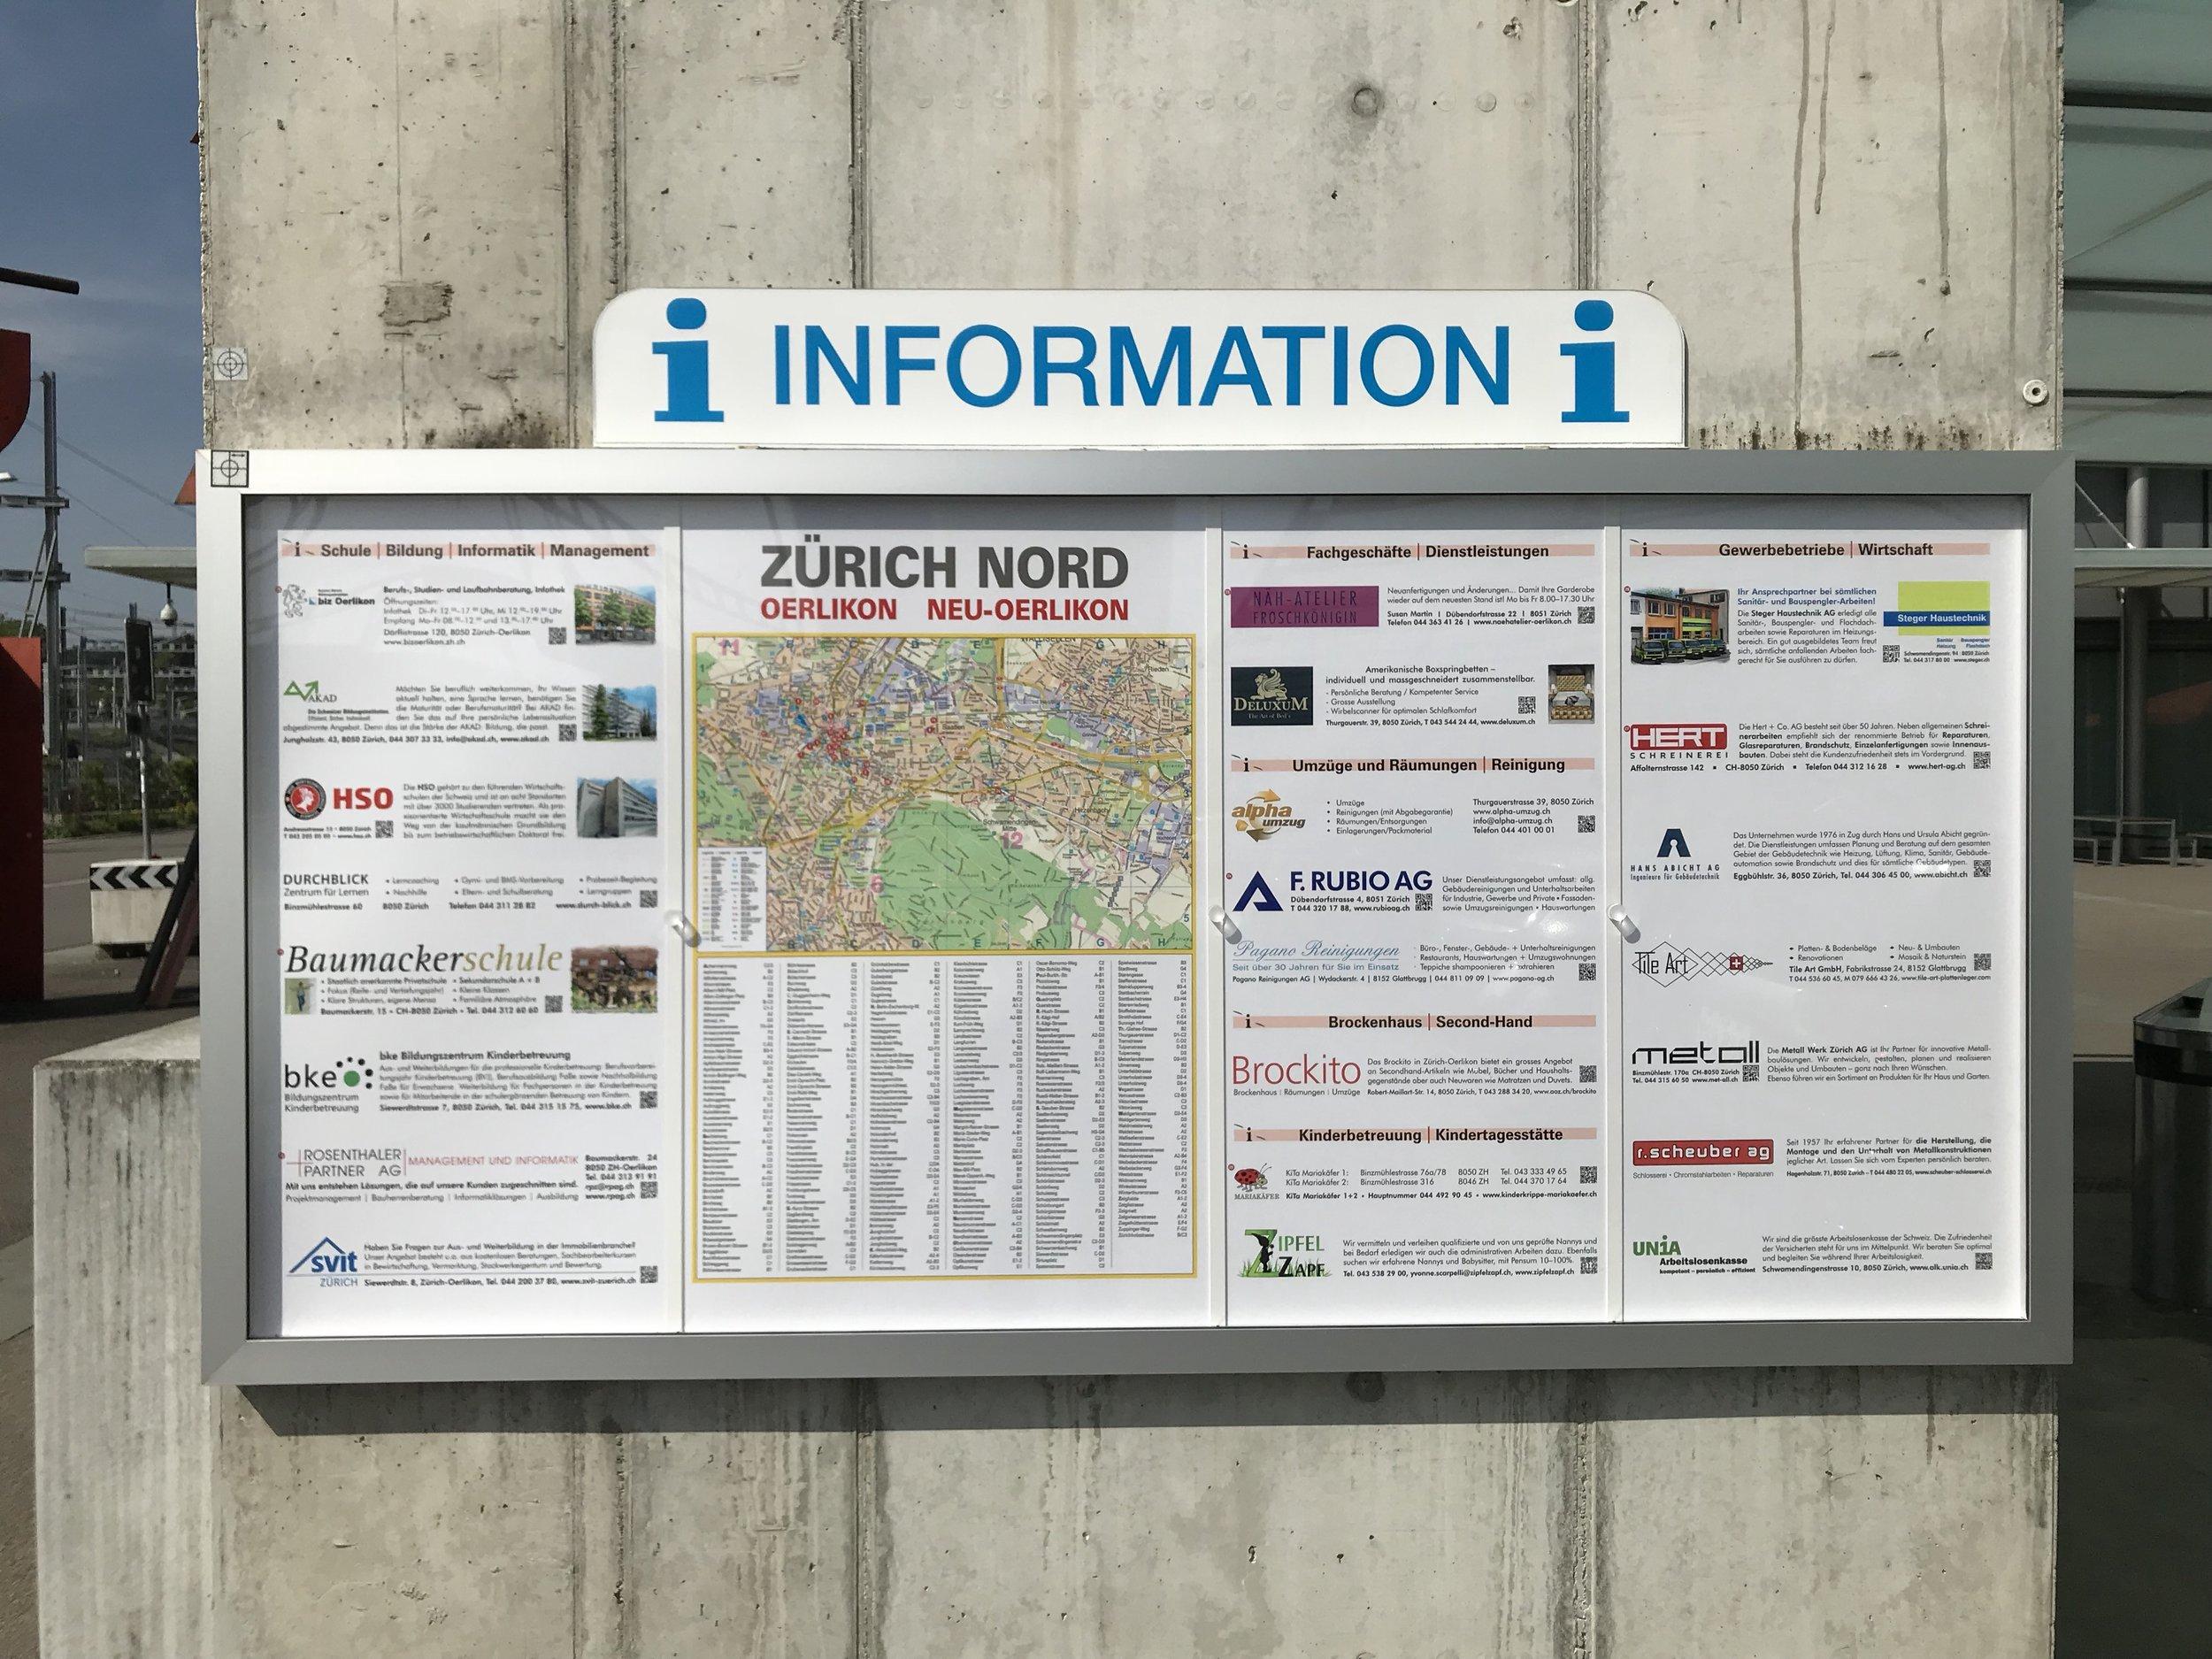 Zuerich-Oerlikon_NEU.JPG